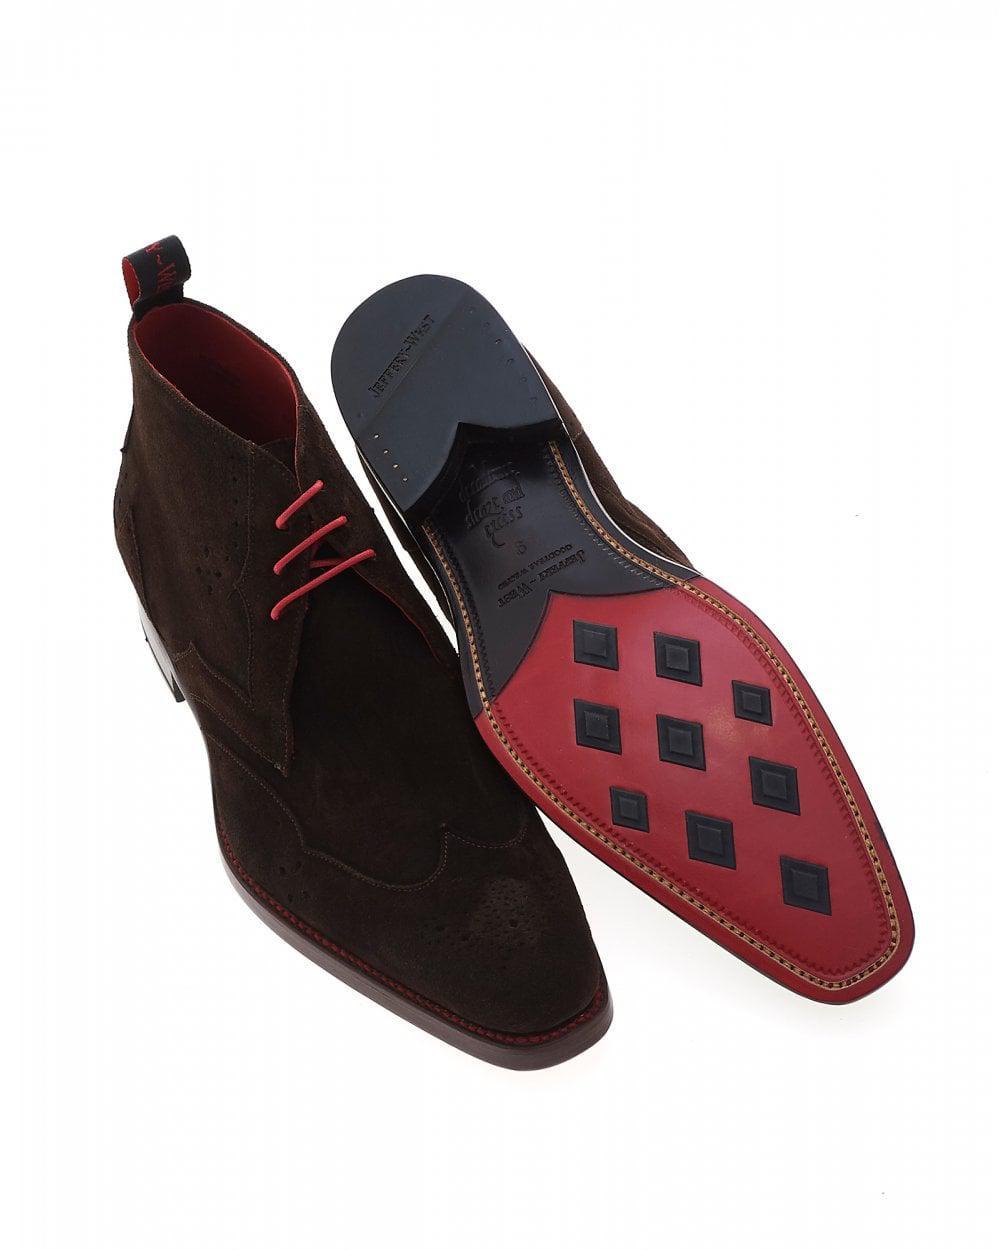 878938409a2e74 Jeffery West Cutthroat Wing Tip Brown Dexter Chukka Boot in Brown for Men -  Lyst